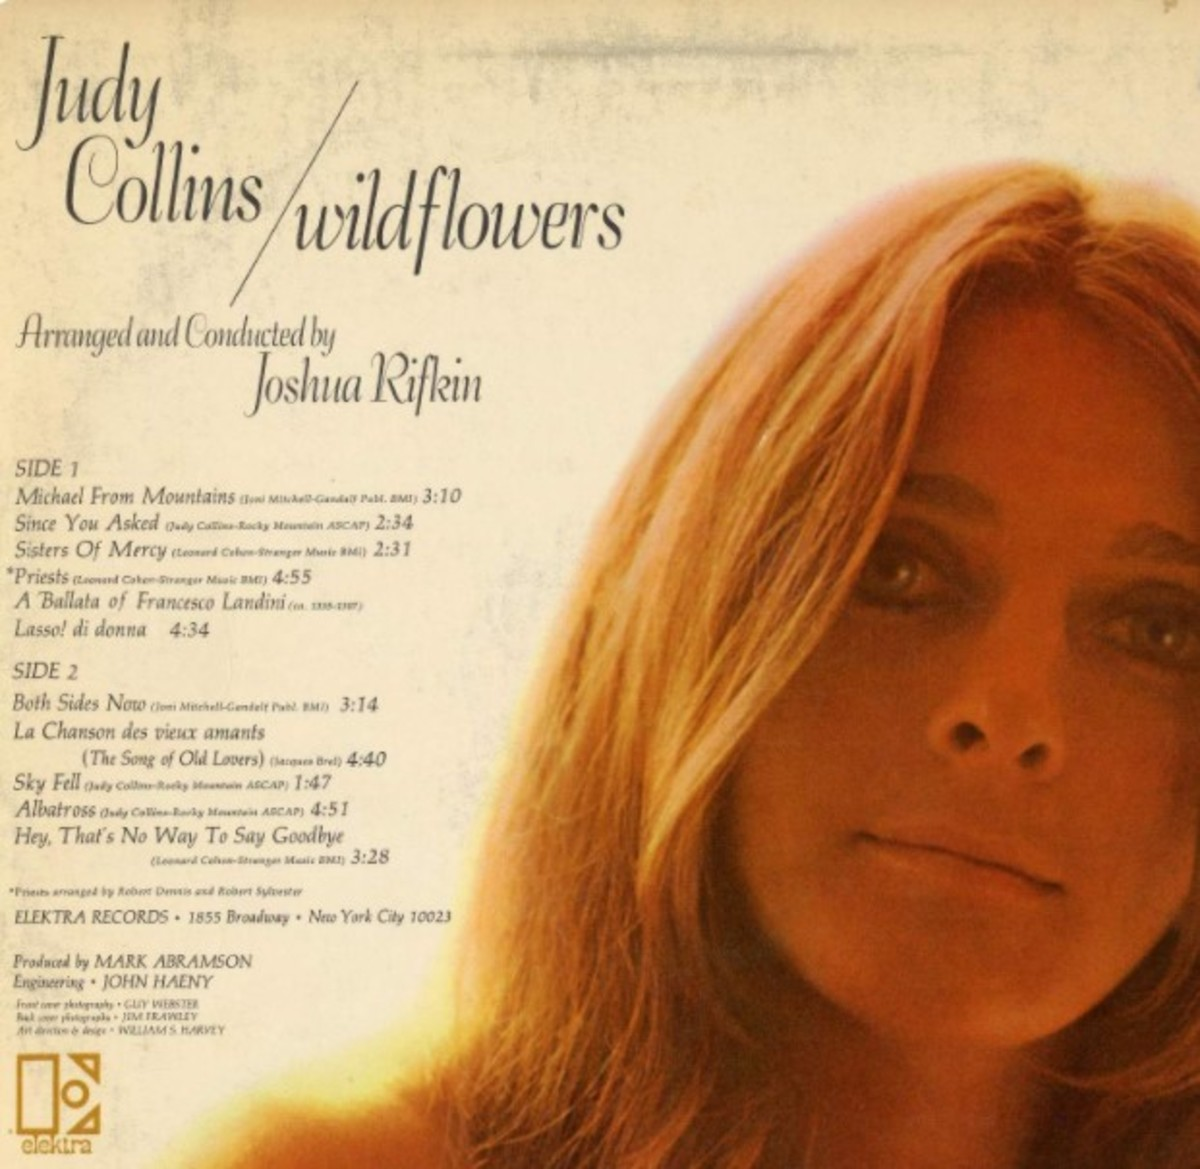 Judy Collins Wildflowers